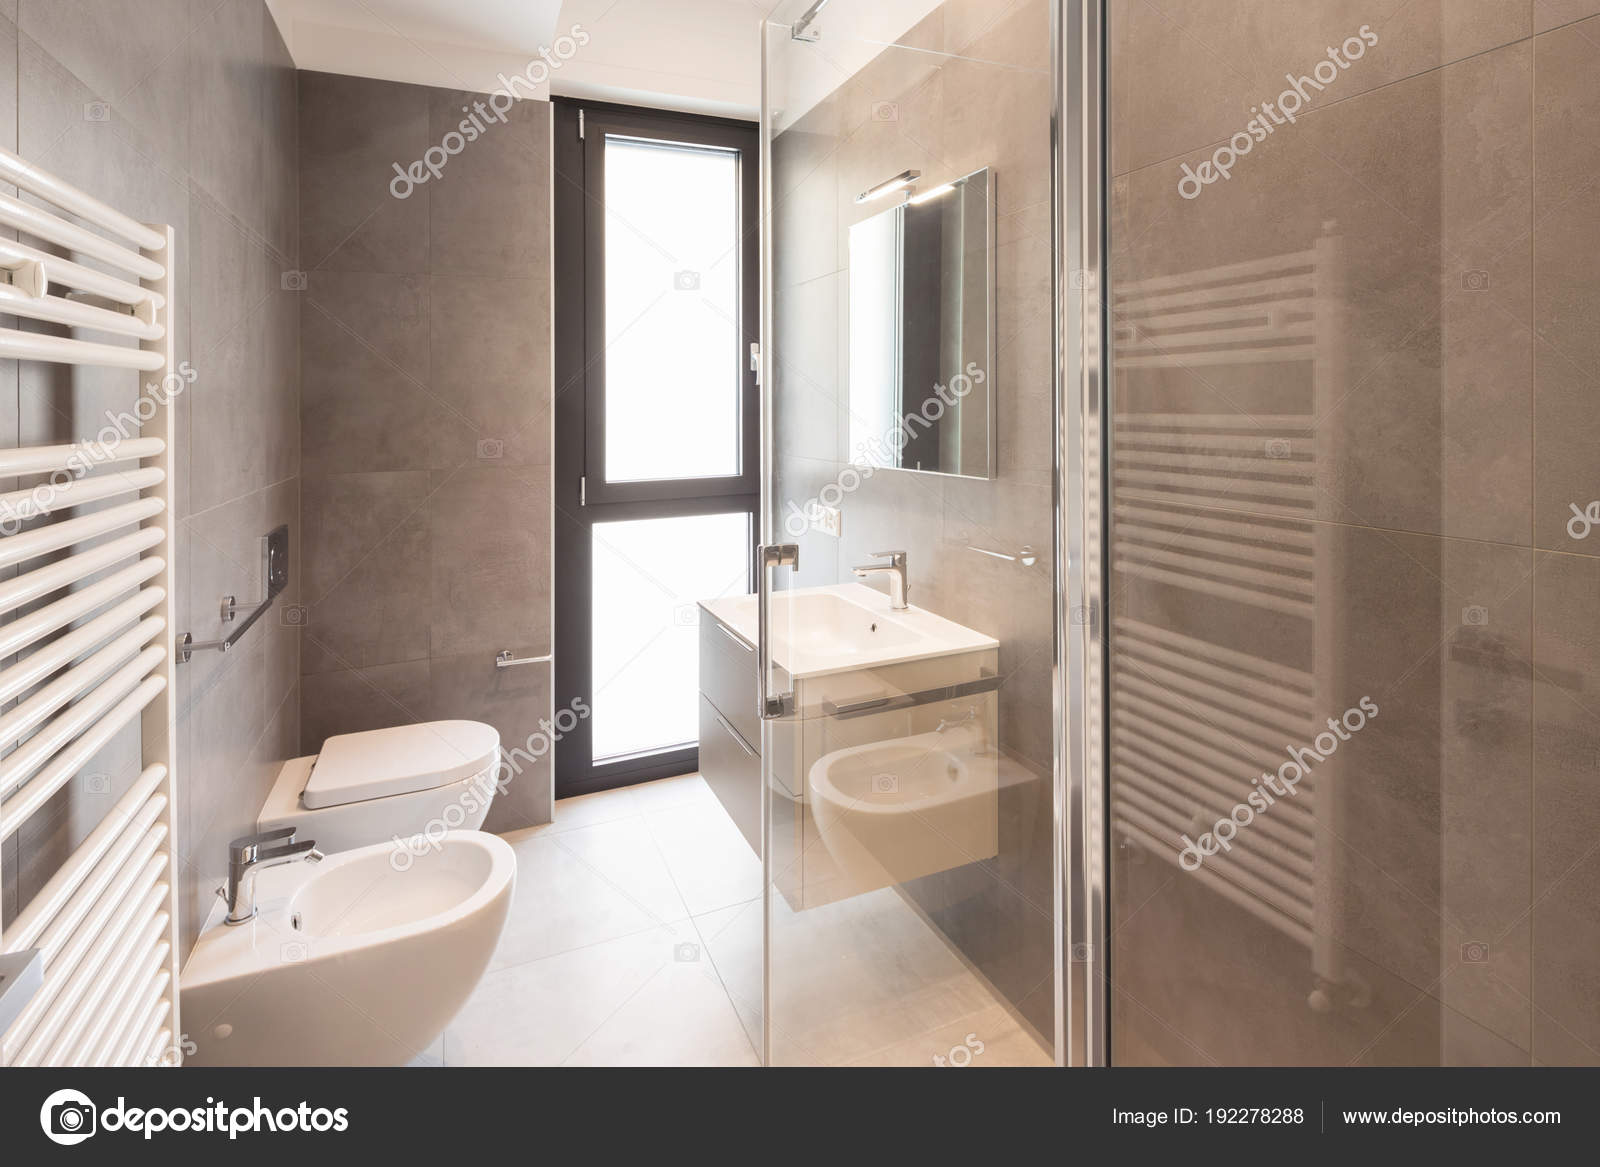 Grote Tegels Badkamer : Minimalistische moderne badkamer met grote tegels u2014 stockfoto